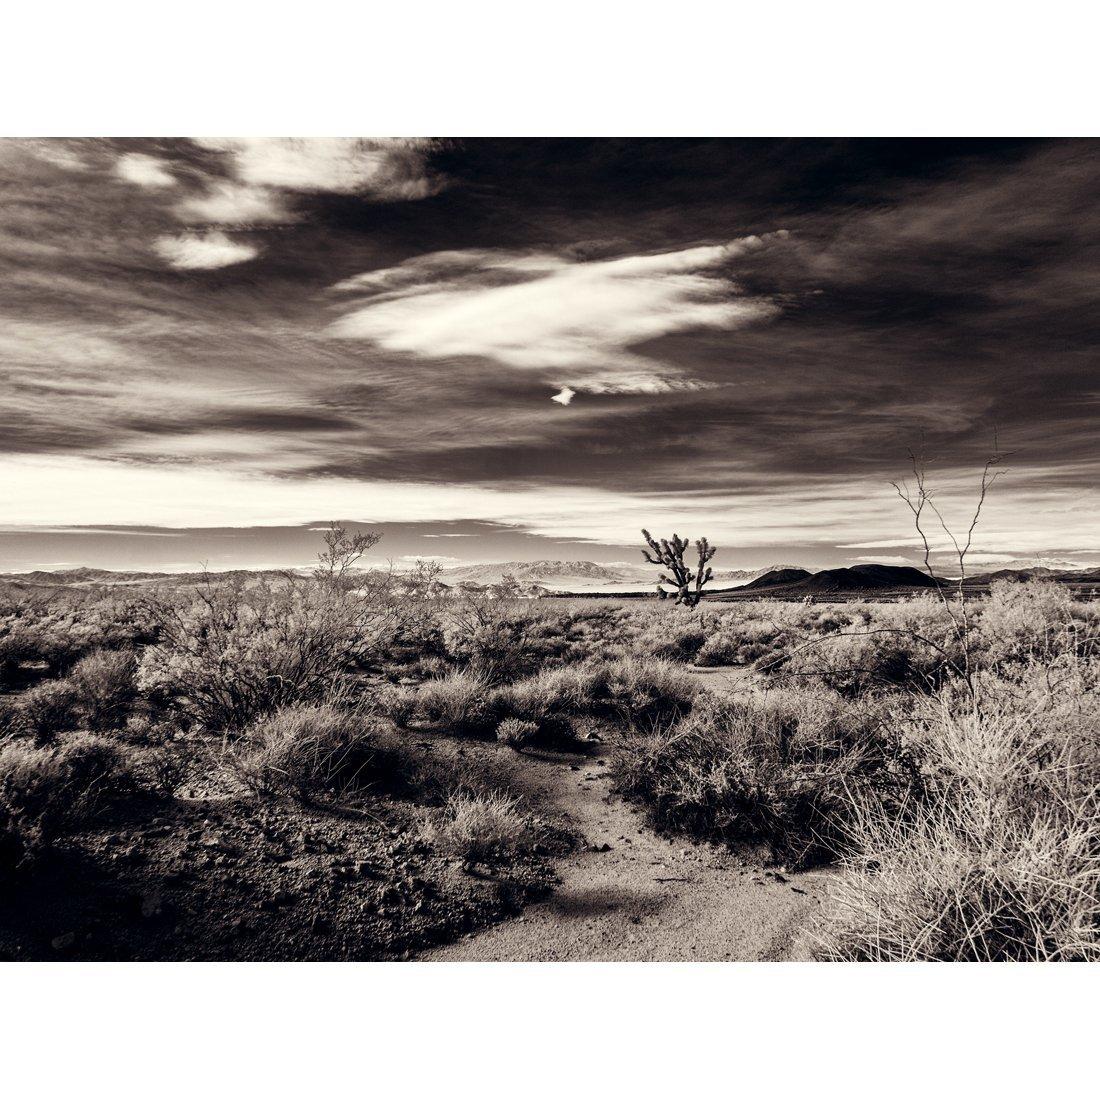 A Joshua Tree In Desert Scrub - Mojave National Preserve California Fine Art Photography Print Black and White by Spectroland